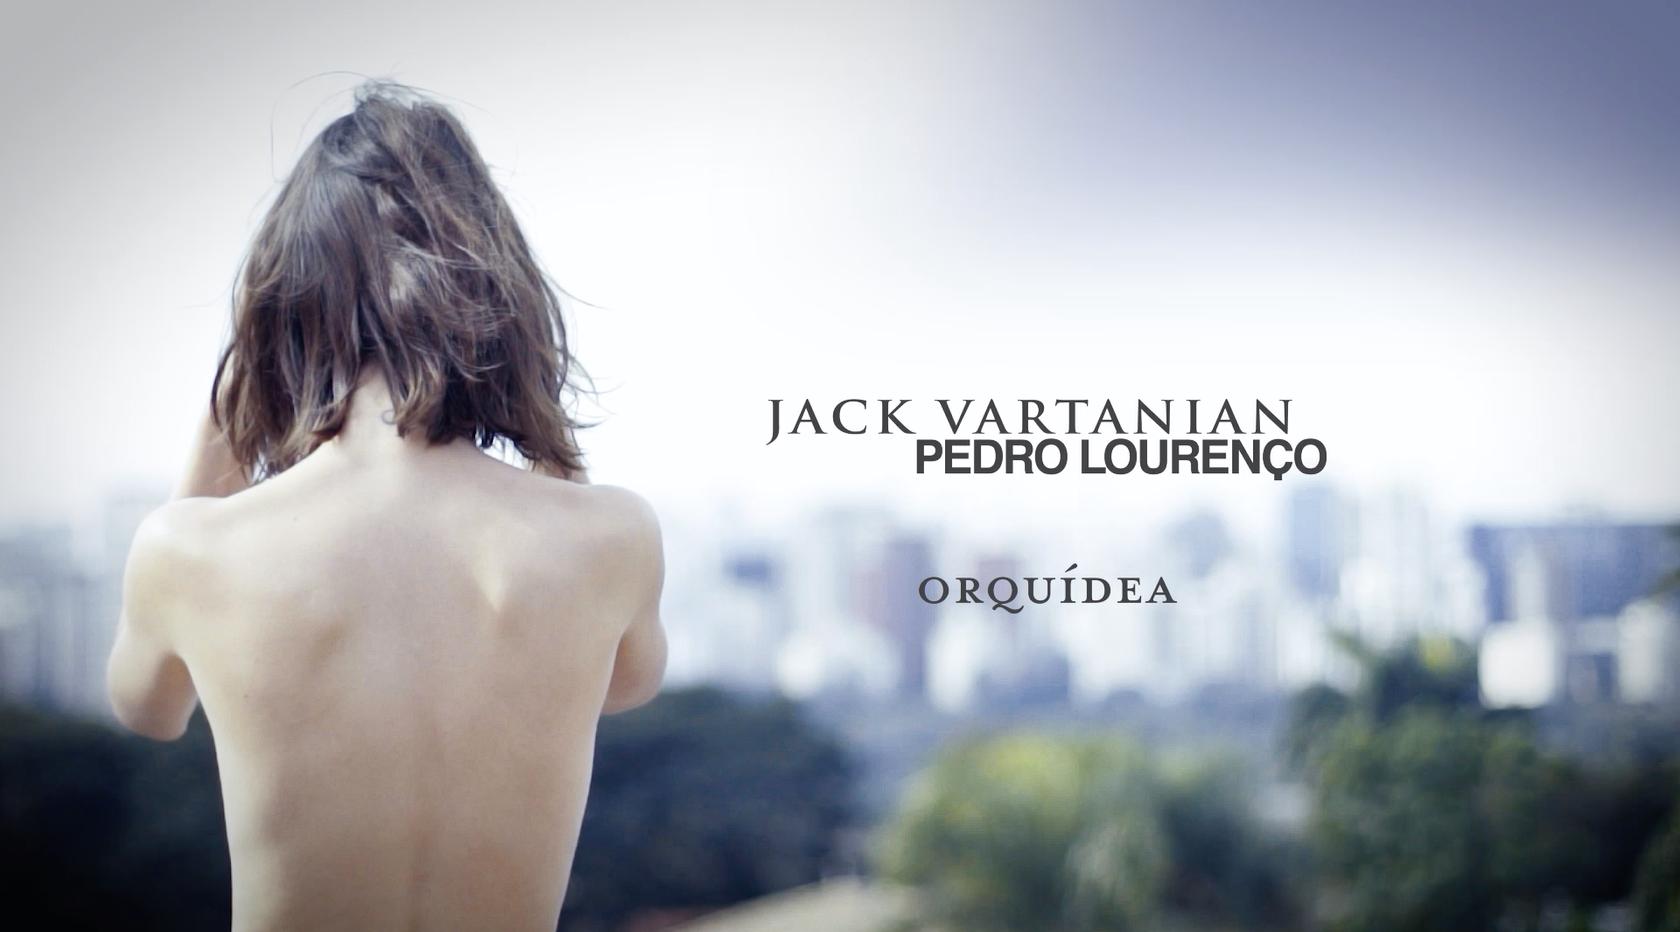 JACK VARTANIAN | COLEÇÃO ORQUÍDEA